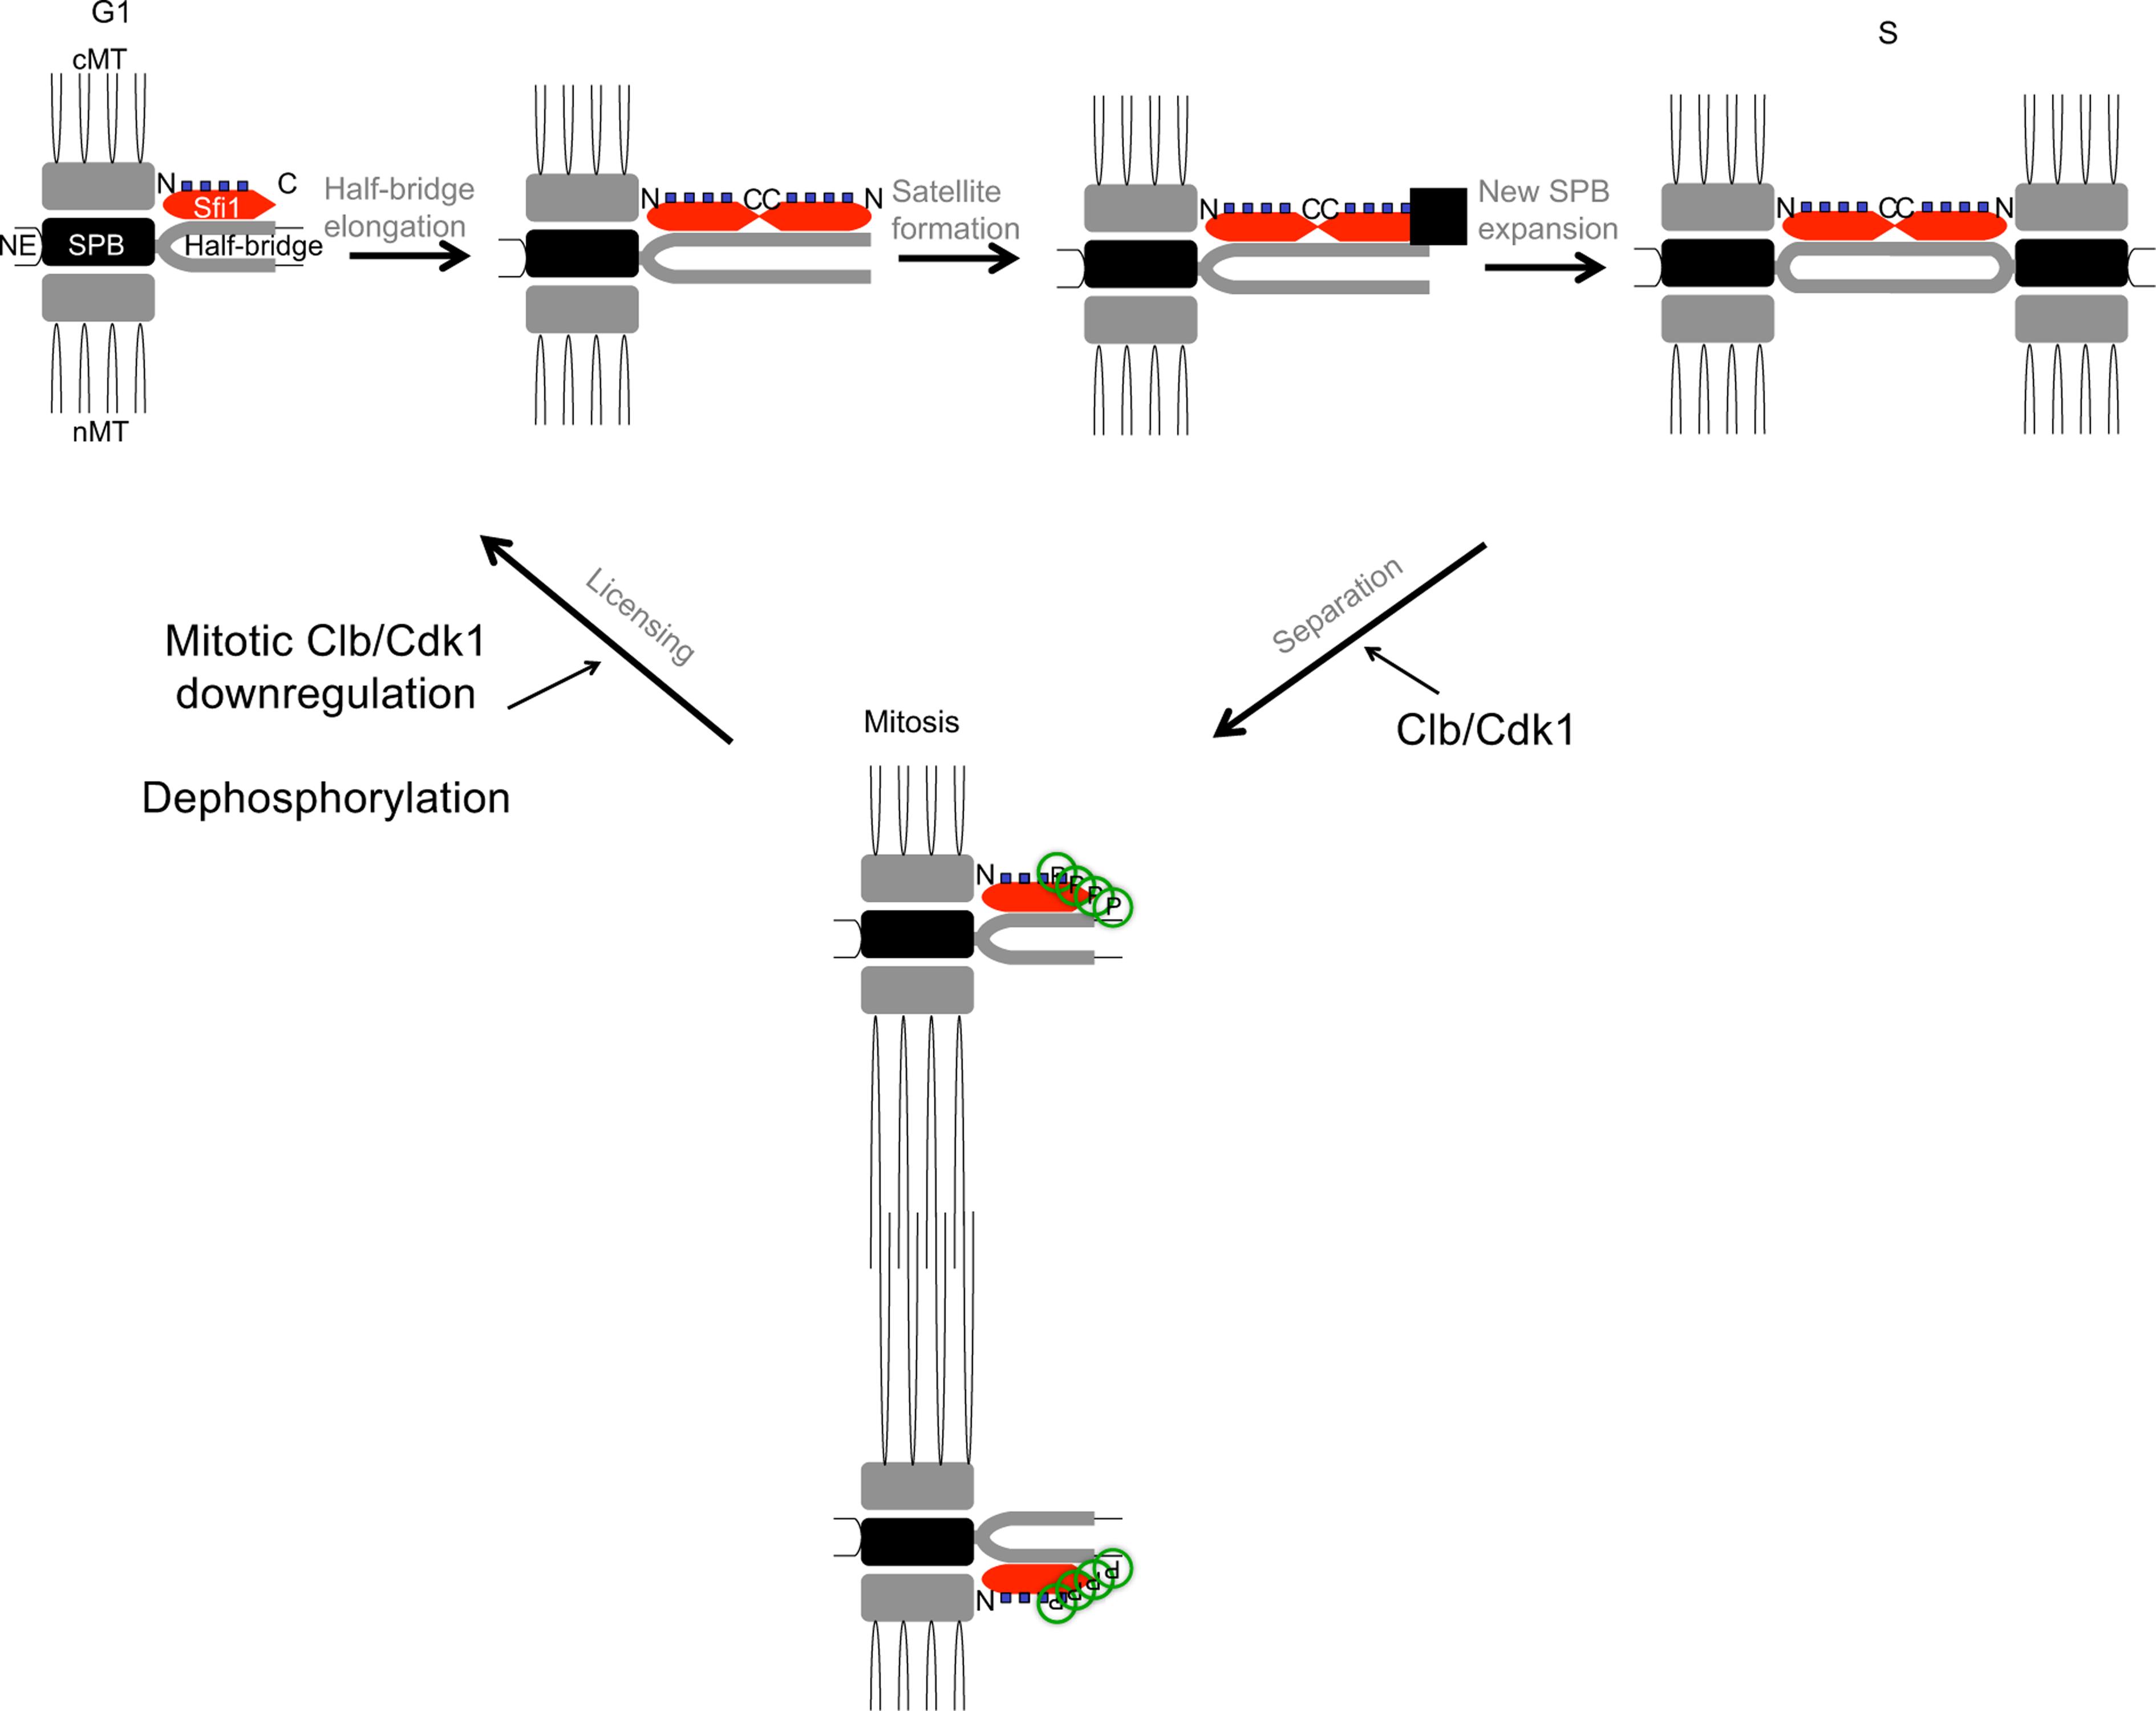 Model for licensing of yeast centrosome duplication via phosphoregulation of Sfi1.